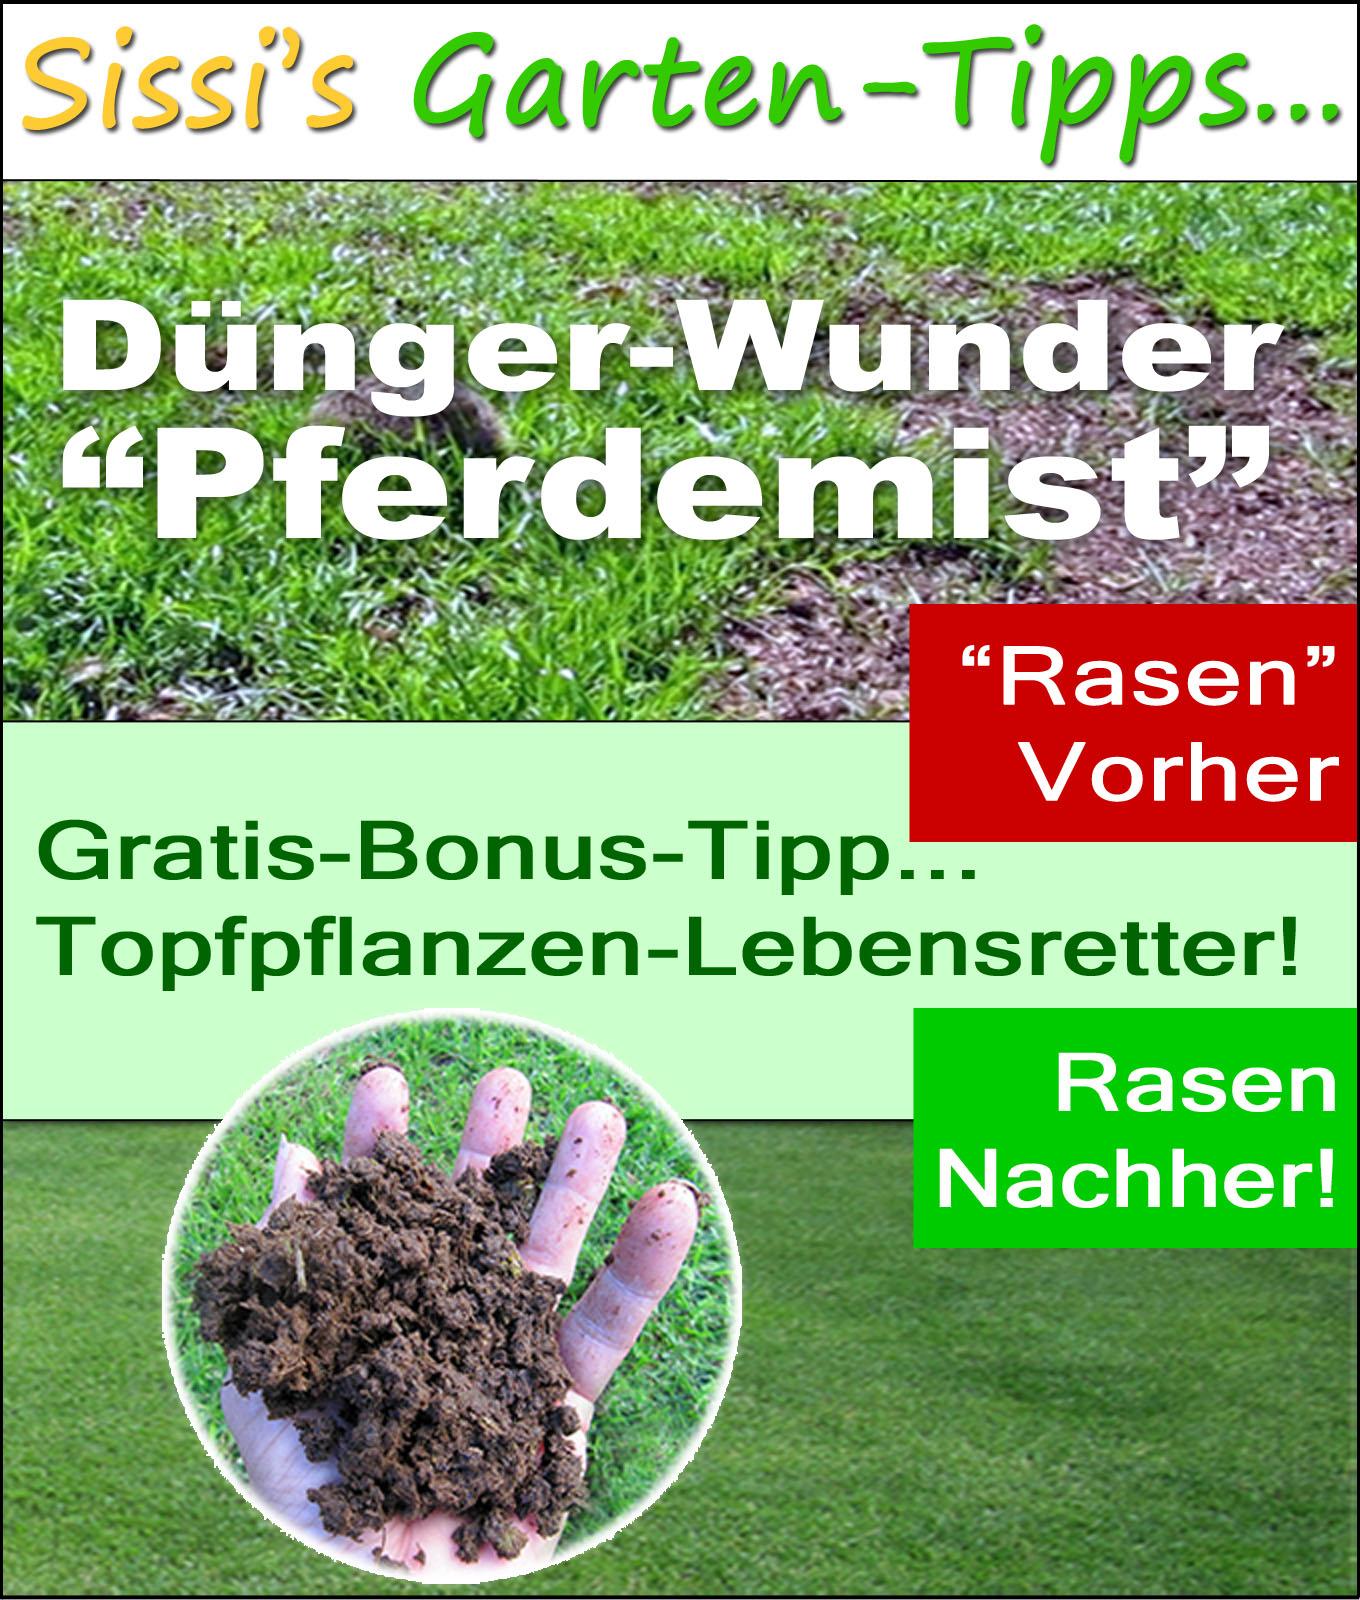 Dünger Wunder Pferdemist, auf Kindle bei Amazon.de